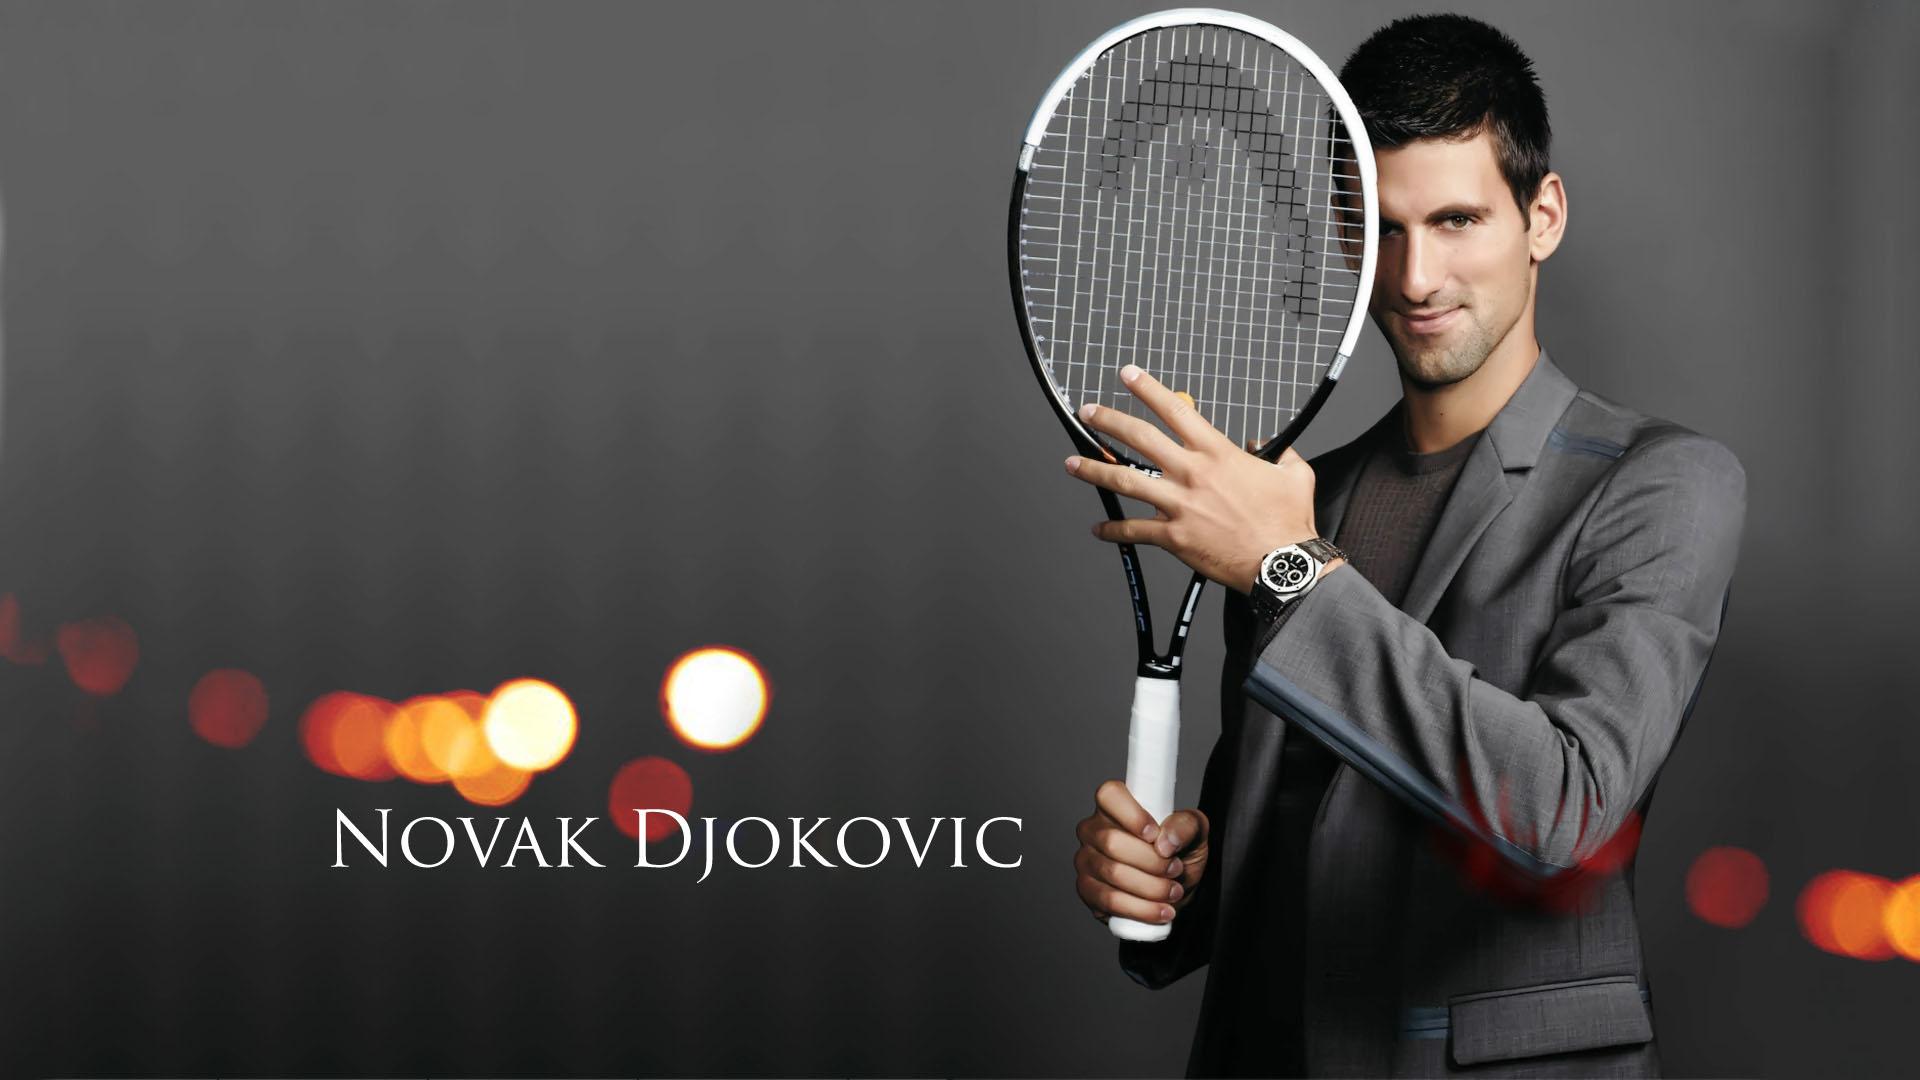 Novak Djokovic Wallpapers   HD Wallpapers Backgrounds of 1920x1080